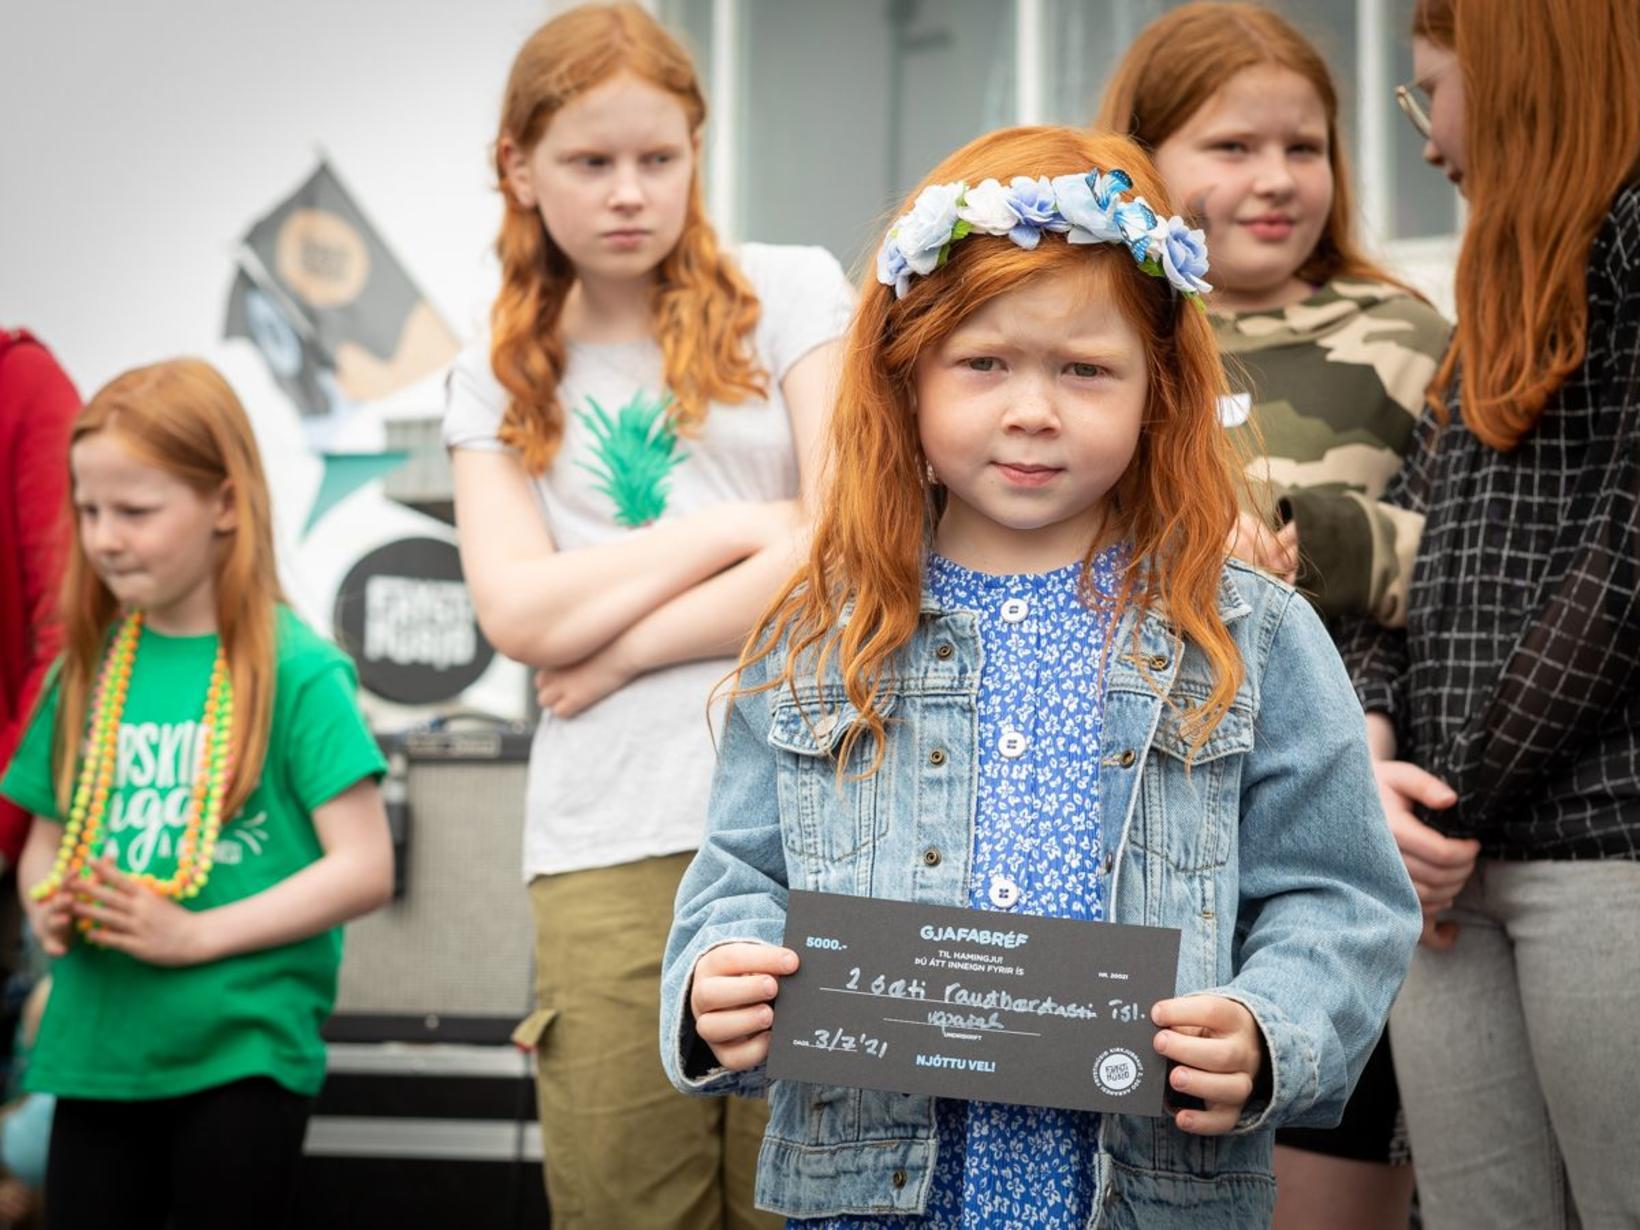 Хельга Дис заняла 2-е место в конкурсе на самого рыжего исландца. Фото / Сунна Гаутадоттир